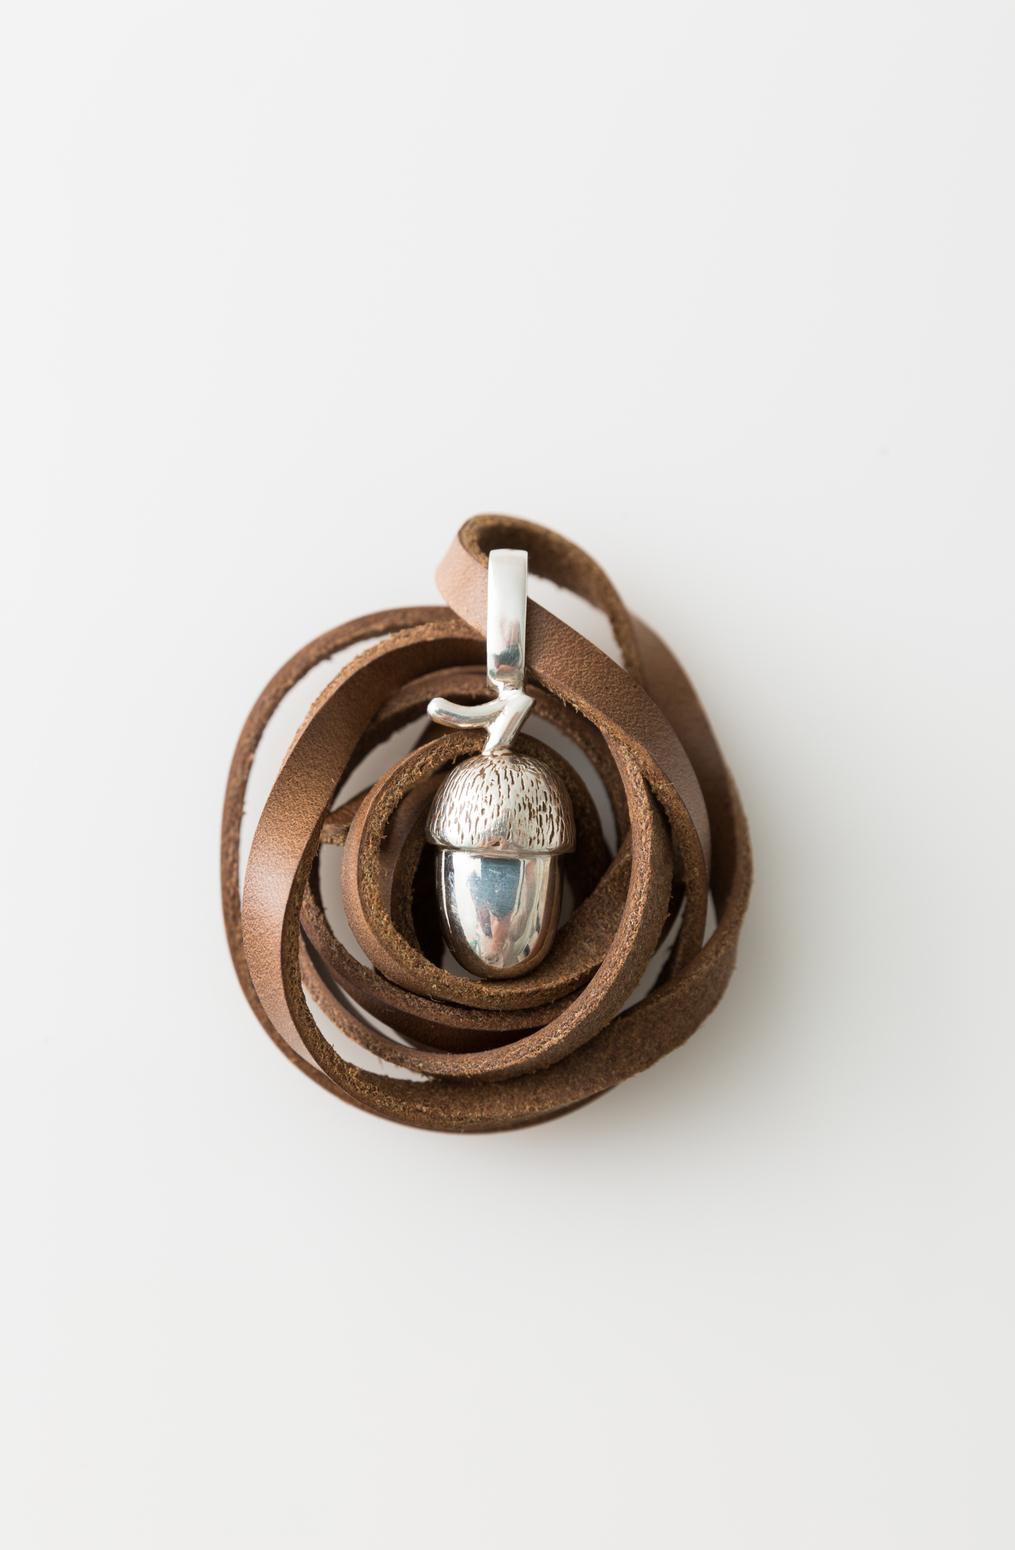 Accessory   acorn pendant necklace   abraham rowe %2825%29